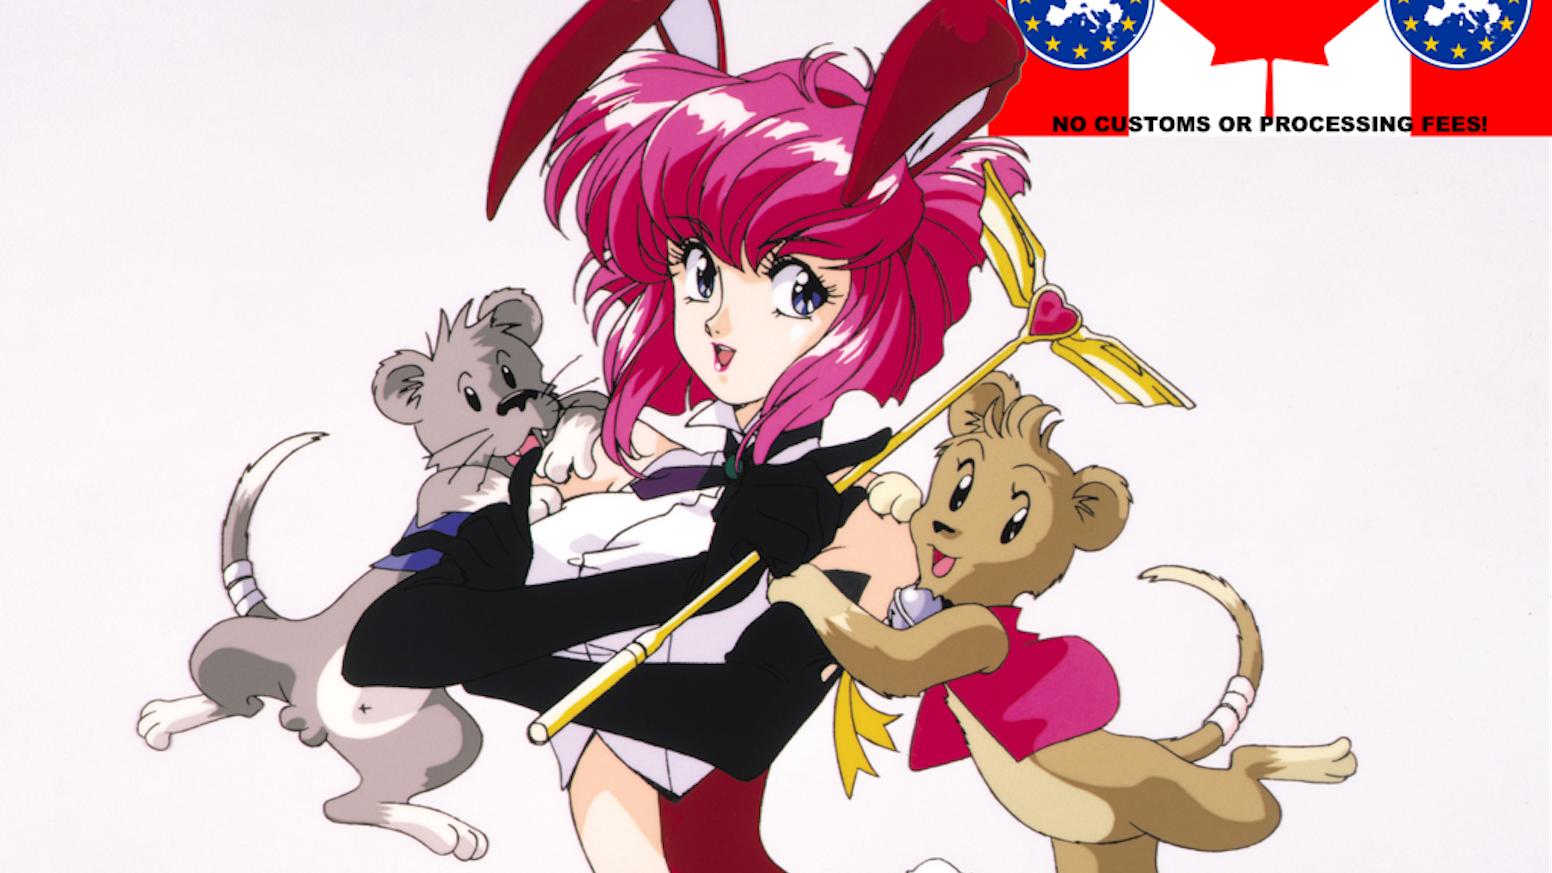 Otaku No Video Otaking Edition Subtitled Anime Blu Ray By Robert J